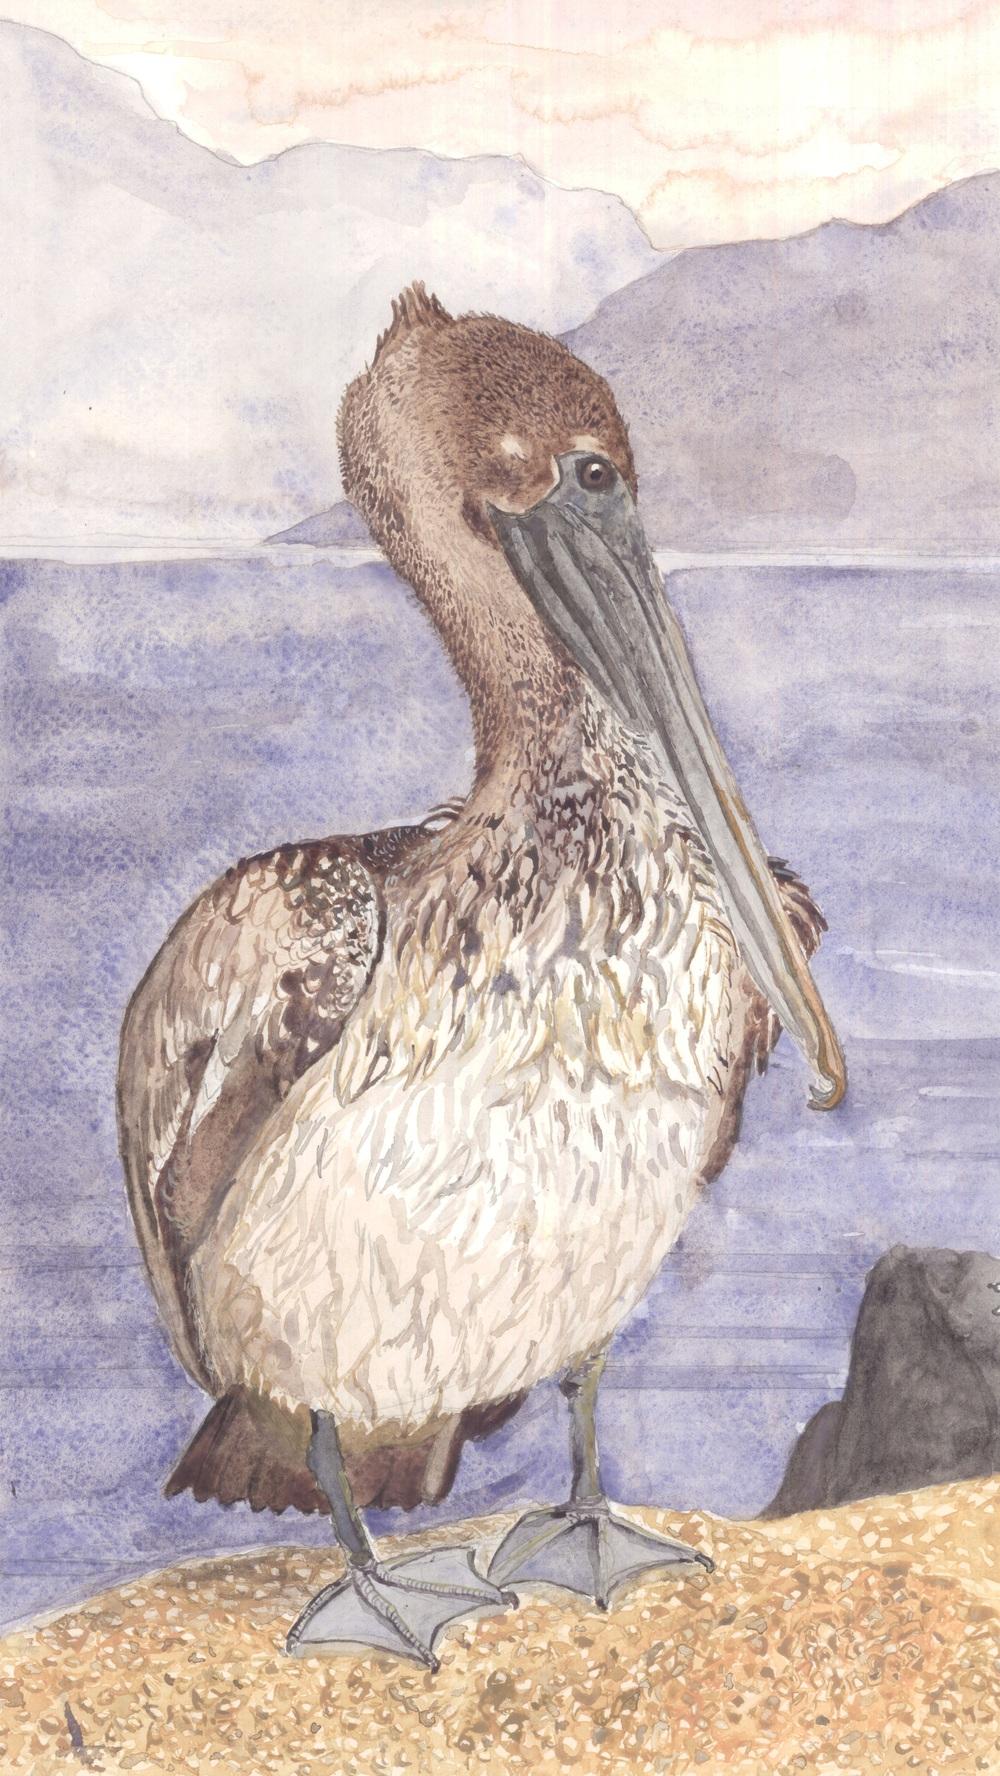 Juvenile Brown Pelican at the Salton Sea in Southern California